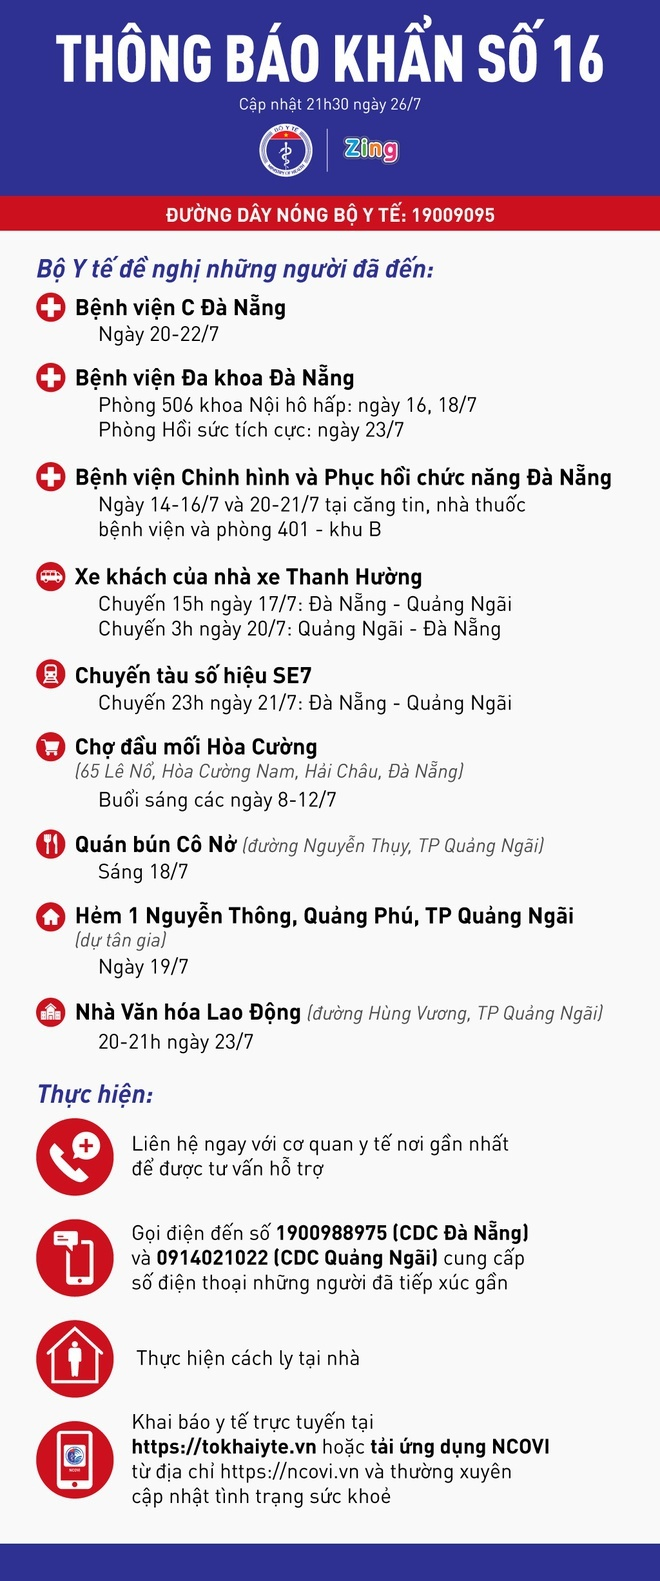 Chung virus SARS-CoV-2 moi anh 2